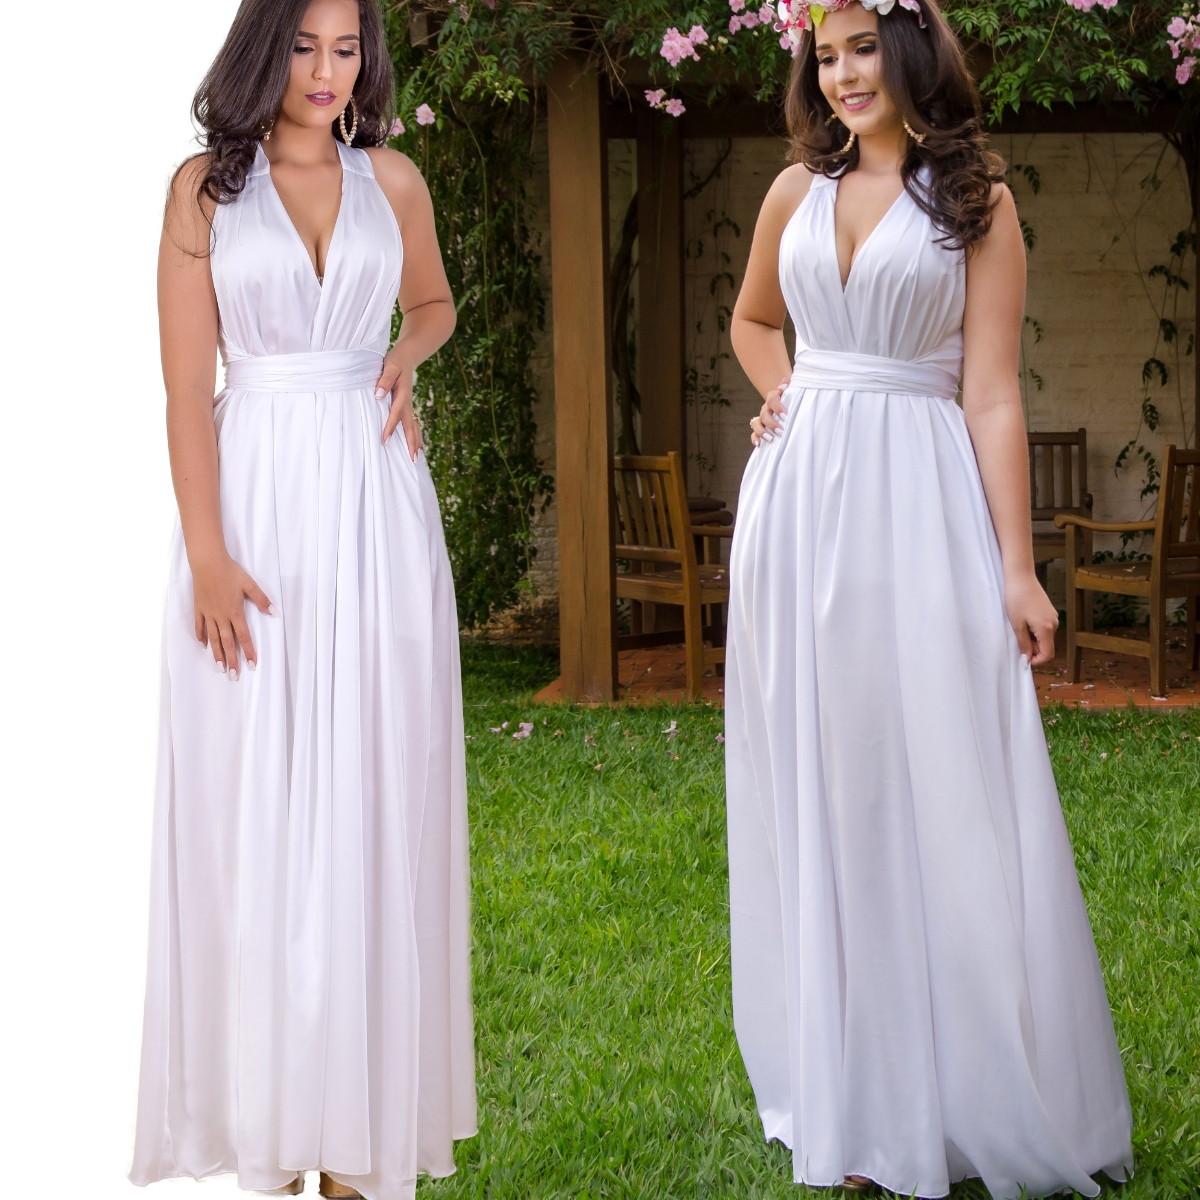 Vestido De Pré Wind Casamento No Civil Casamento No Campo